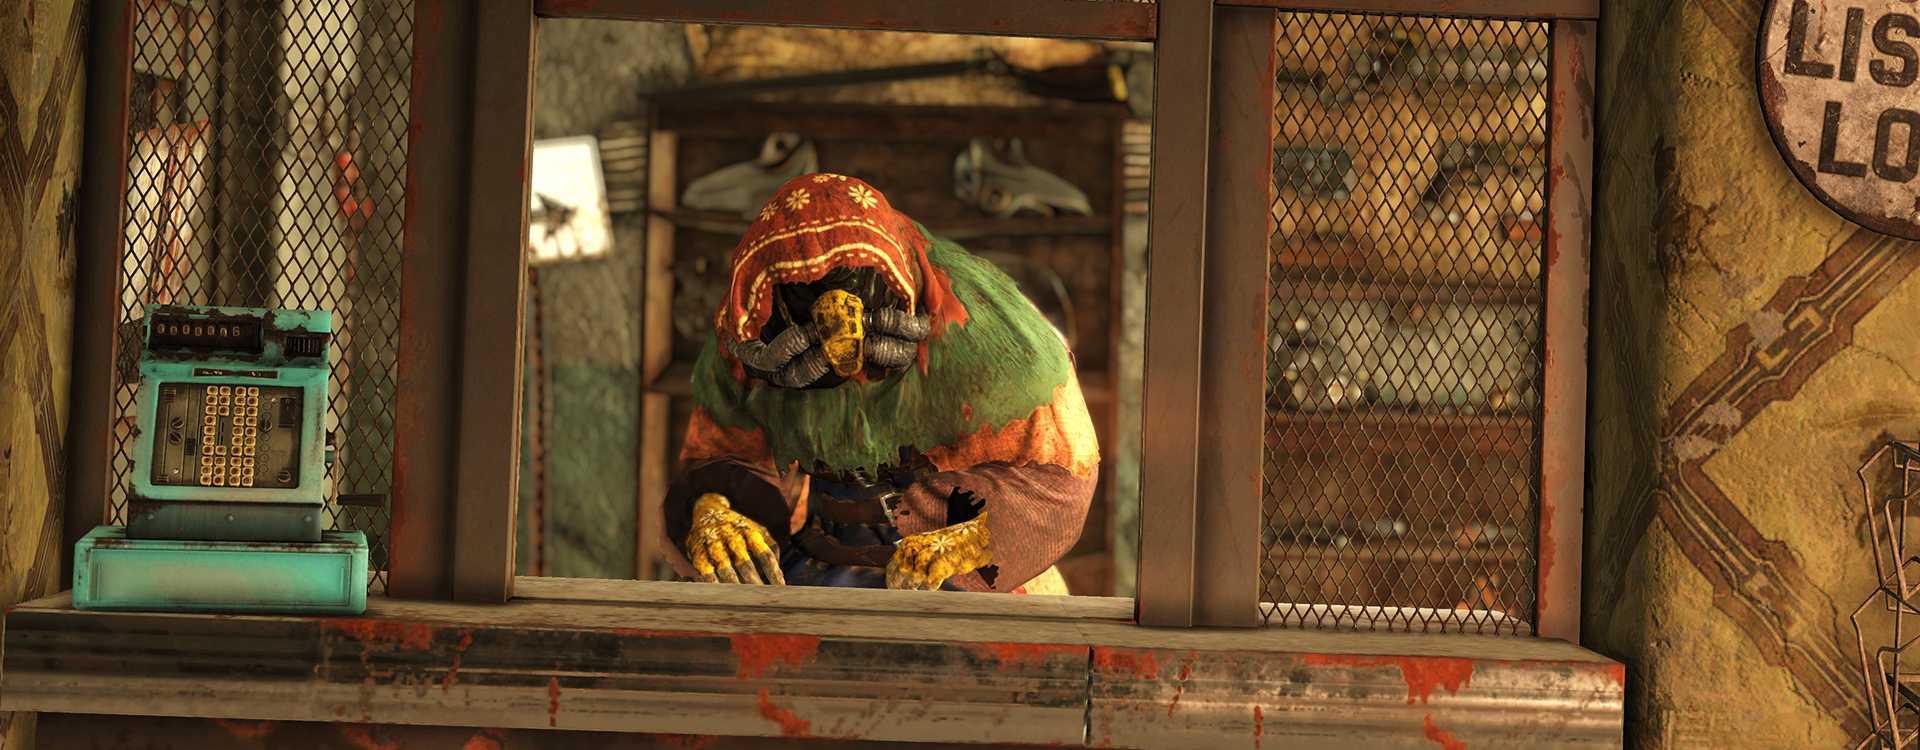 Der legendäre Händler in Fallout 76 kommt schon früher – So funktioniert er